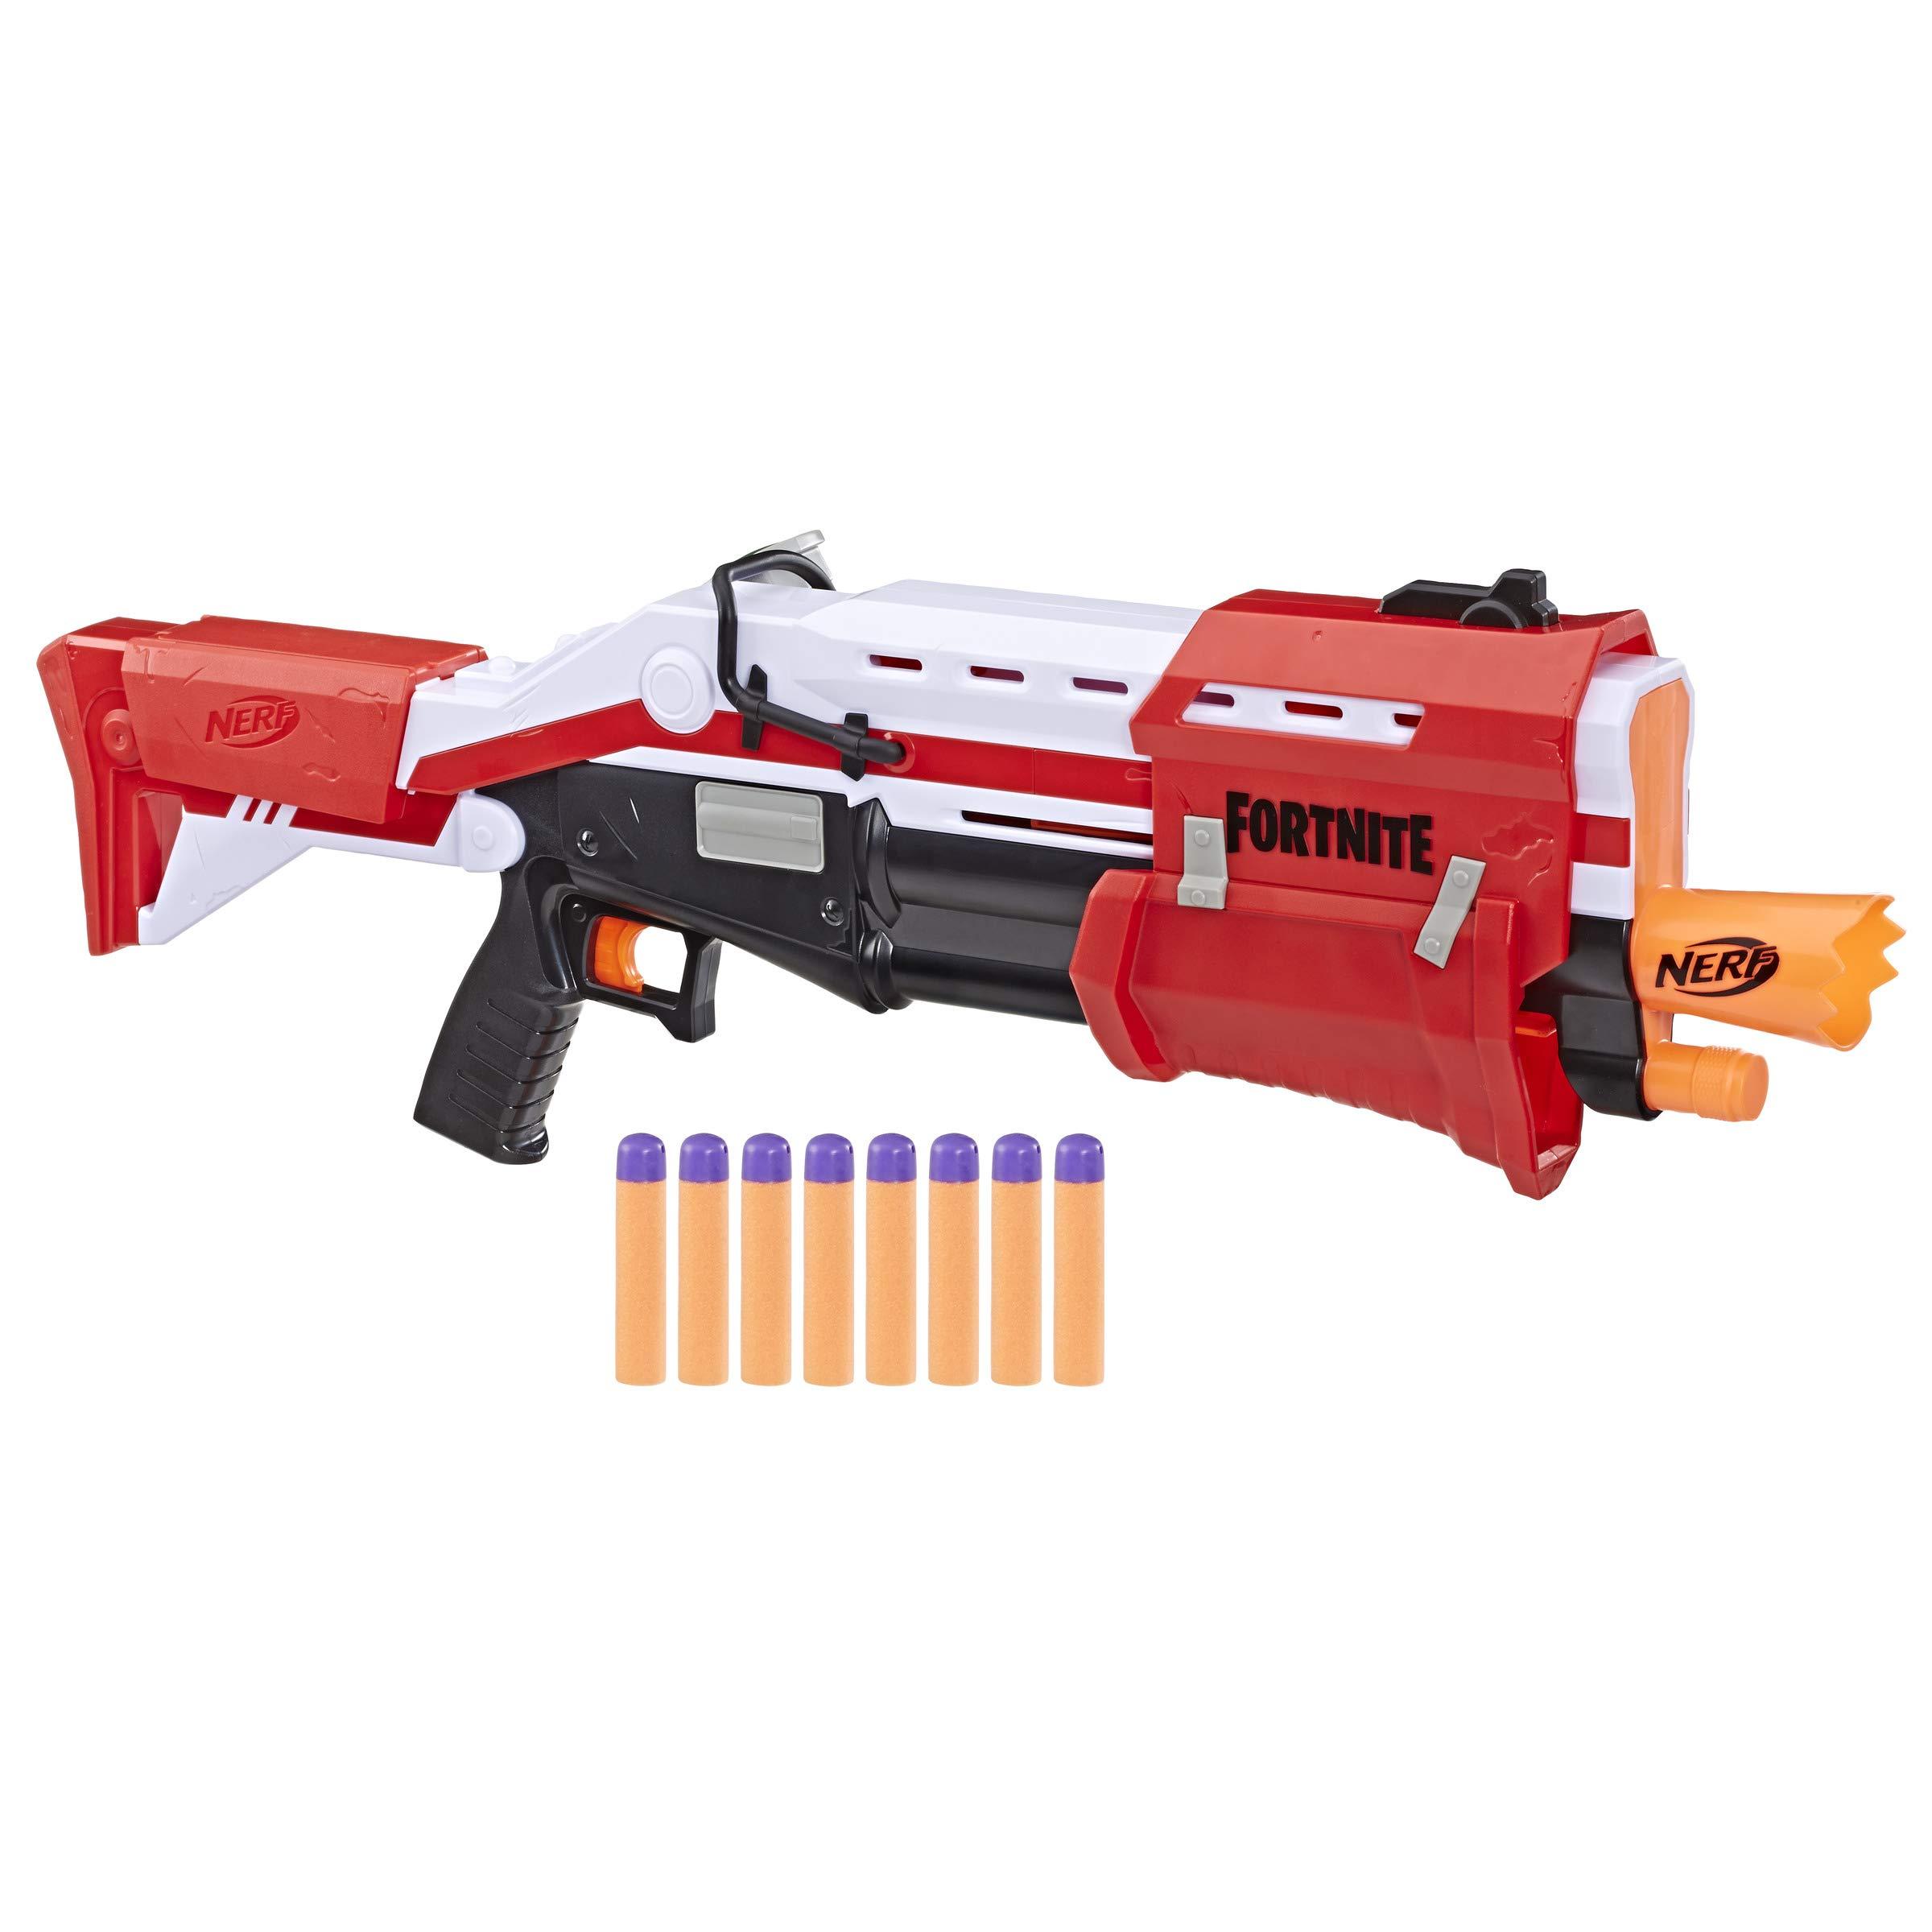 Nerf Fortnite TS-1 Blaster by NERF